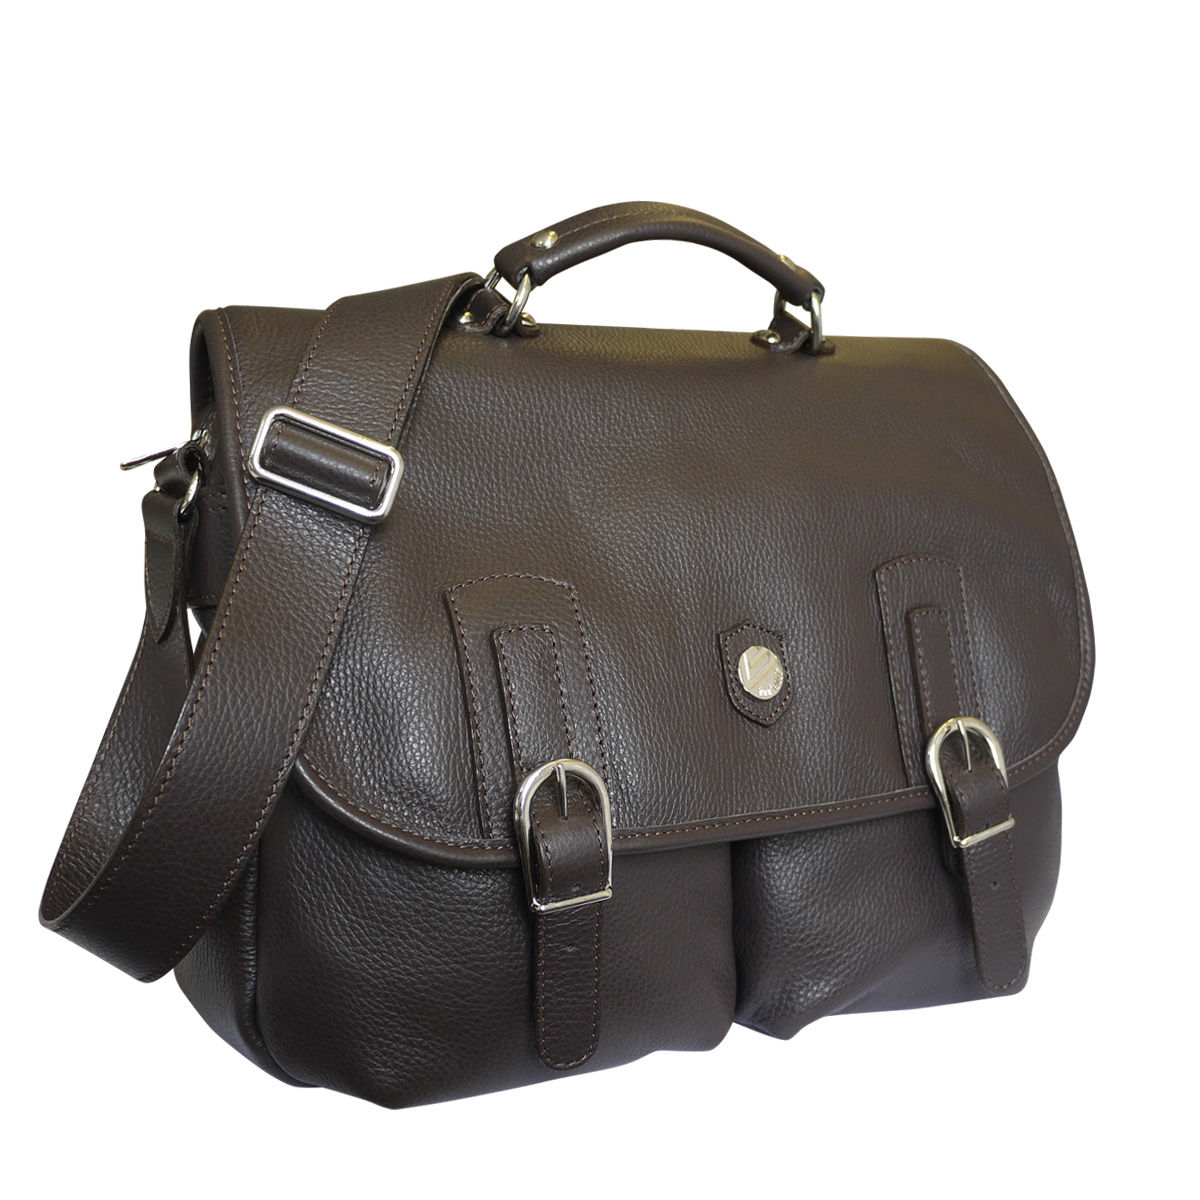 3a158b180a30 Bonfanti Luxury Italian Designer Harris Tweed and Leather Bags - Attavanti